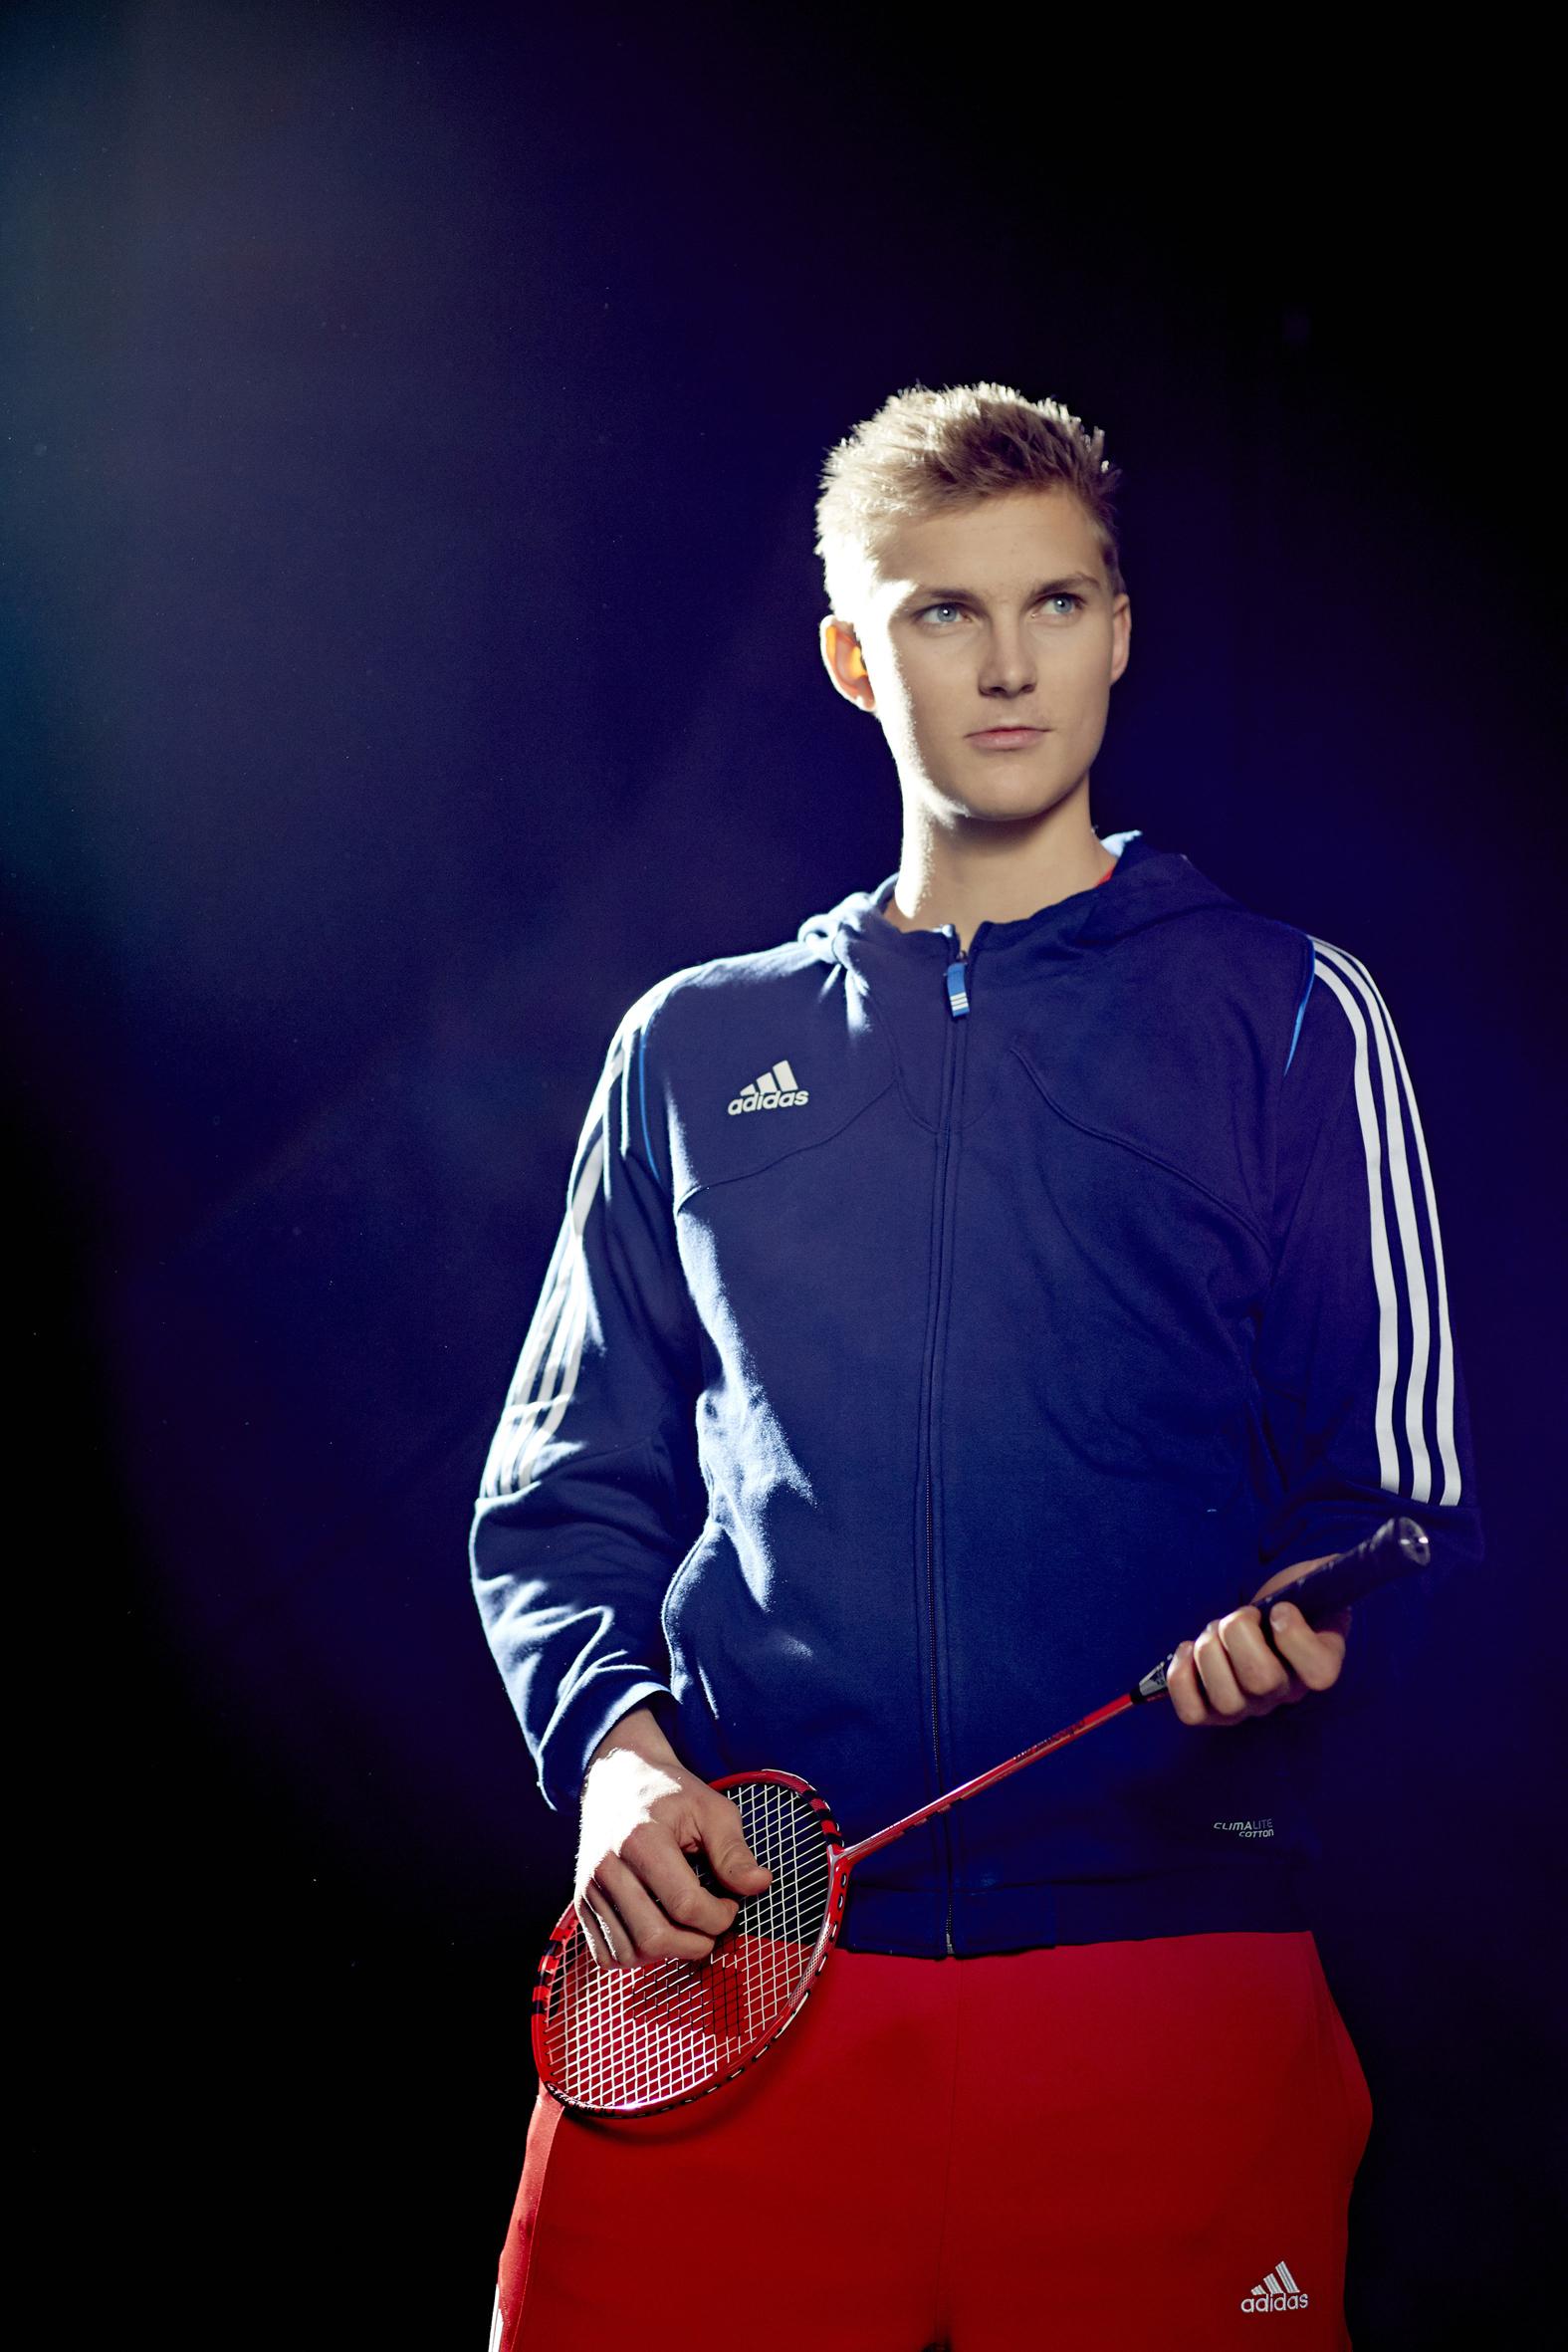 Viktor Axelsen, ambassadeur adidas pour le badminton